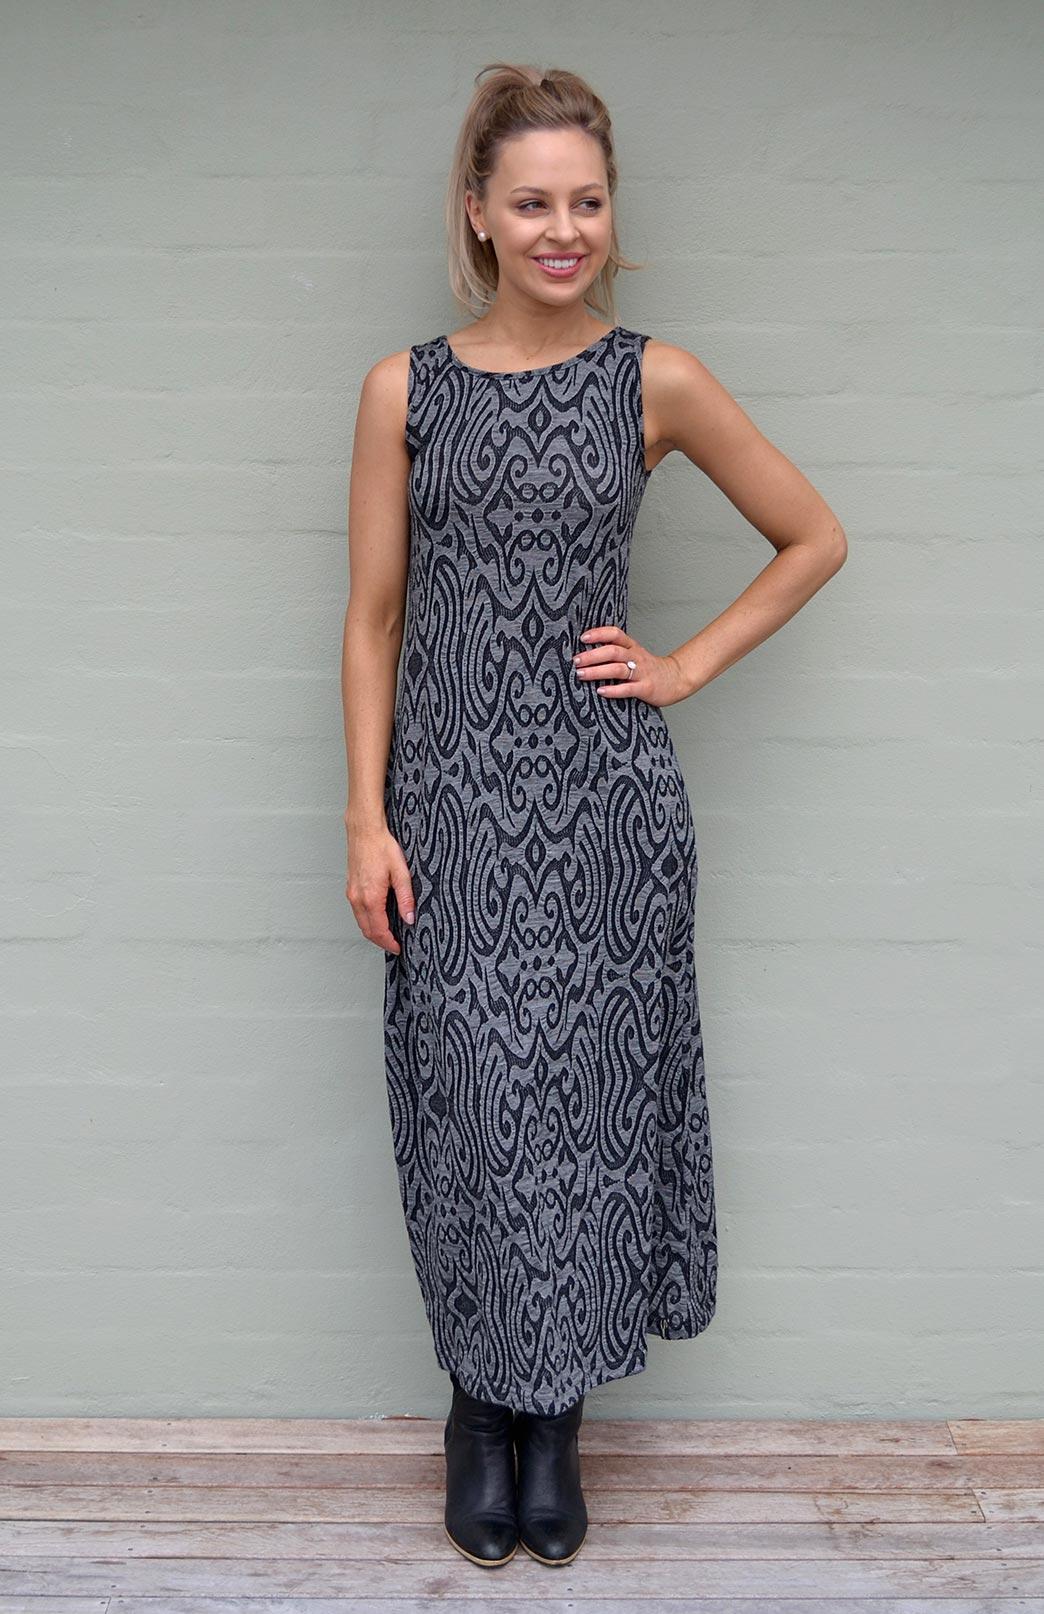 Boat Neck Maxi Dress - Pattern - Women's Black & Grey Long Wool Maxi Summer Dress - Smitten Merino Tasmania Australia